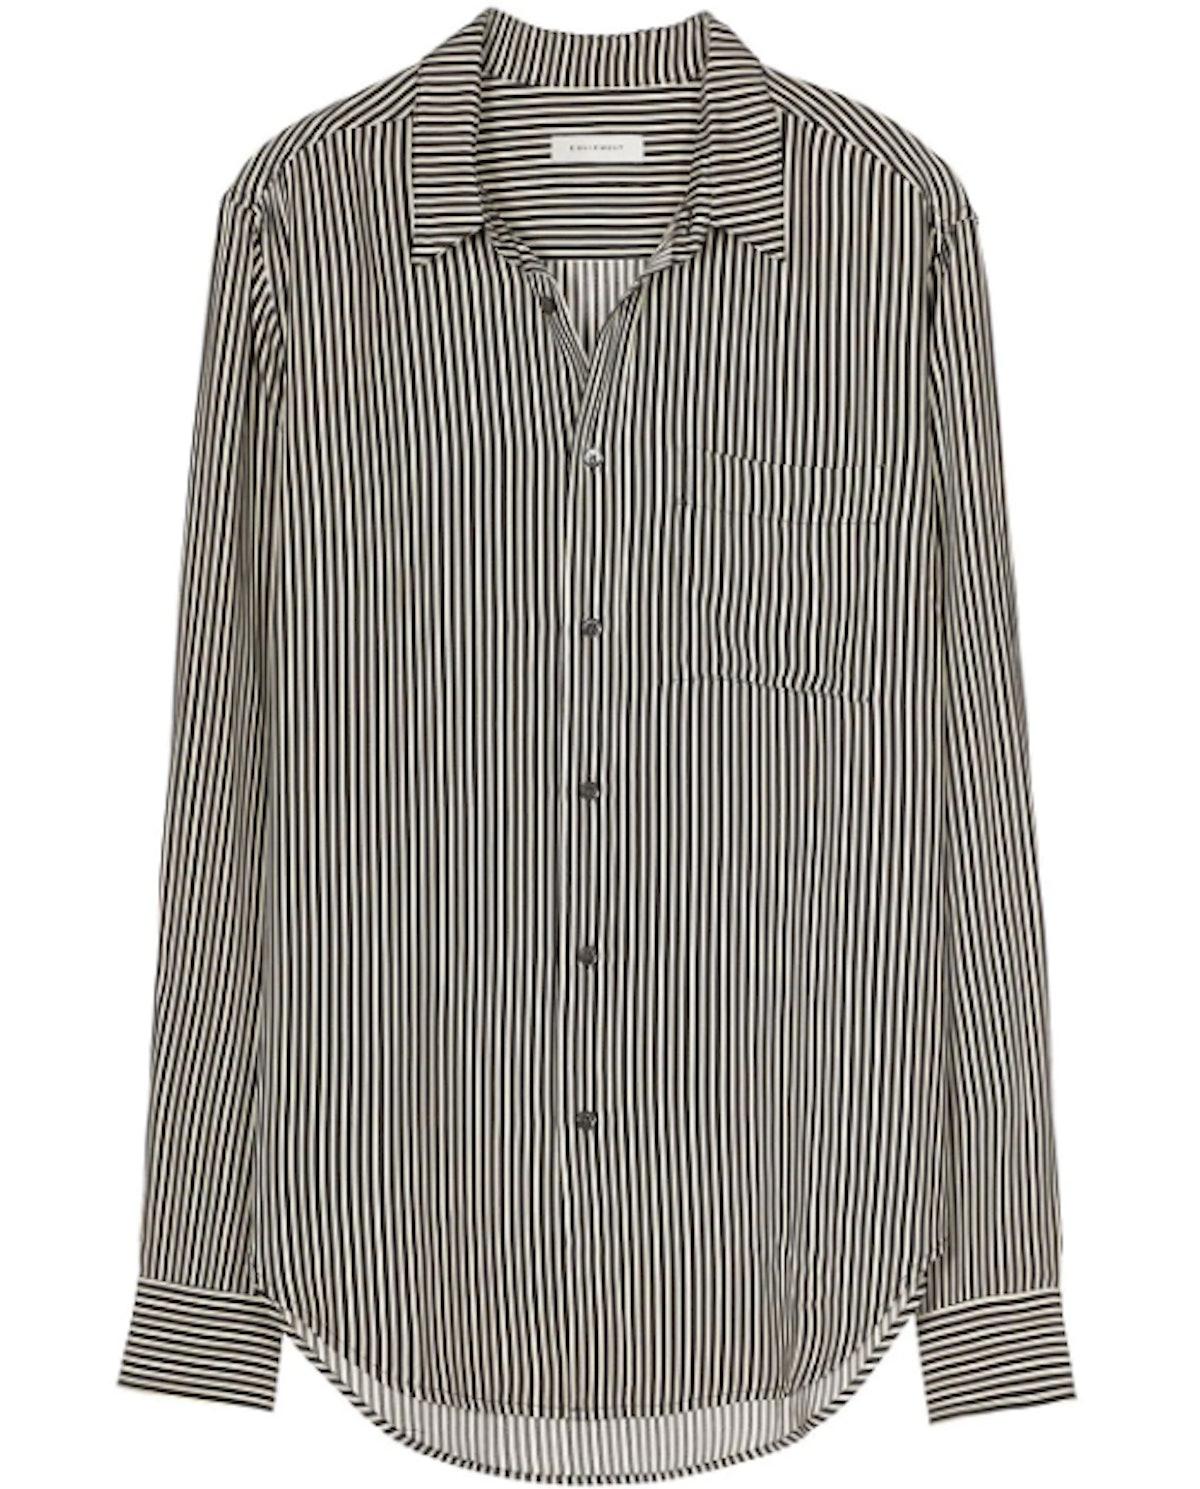 Pinstriped Slim Fit Shirt